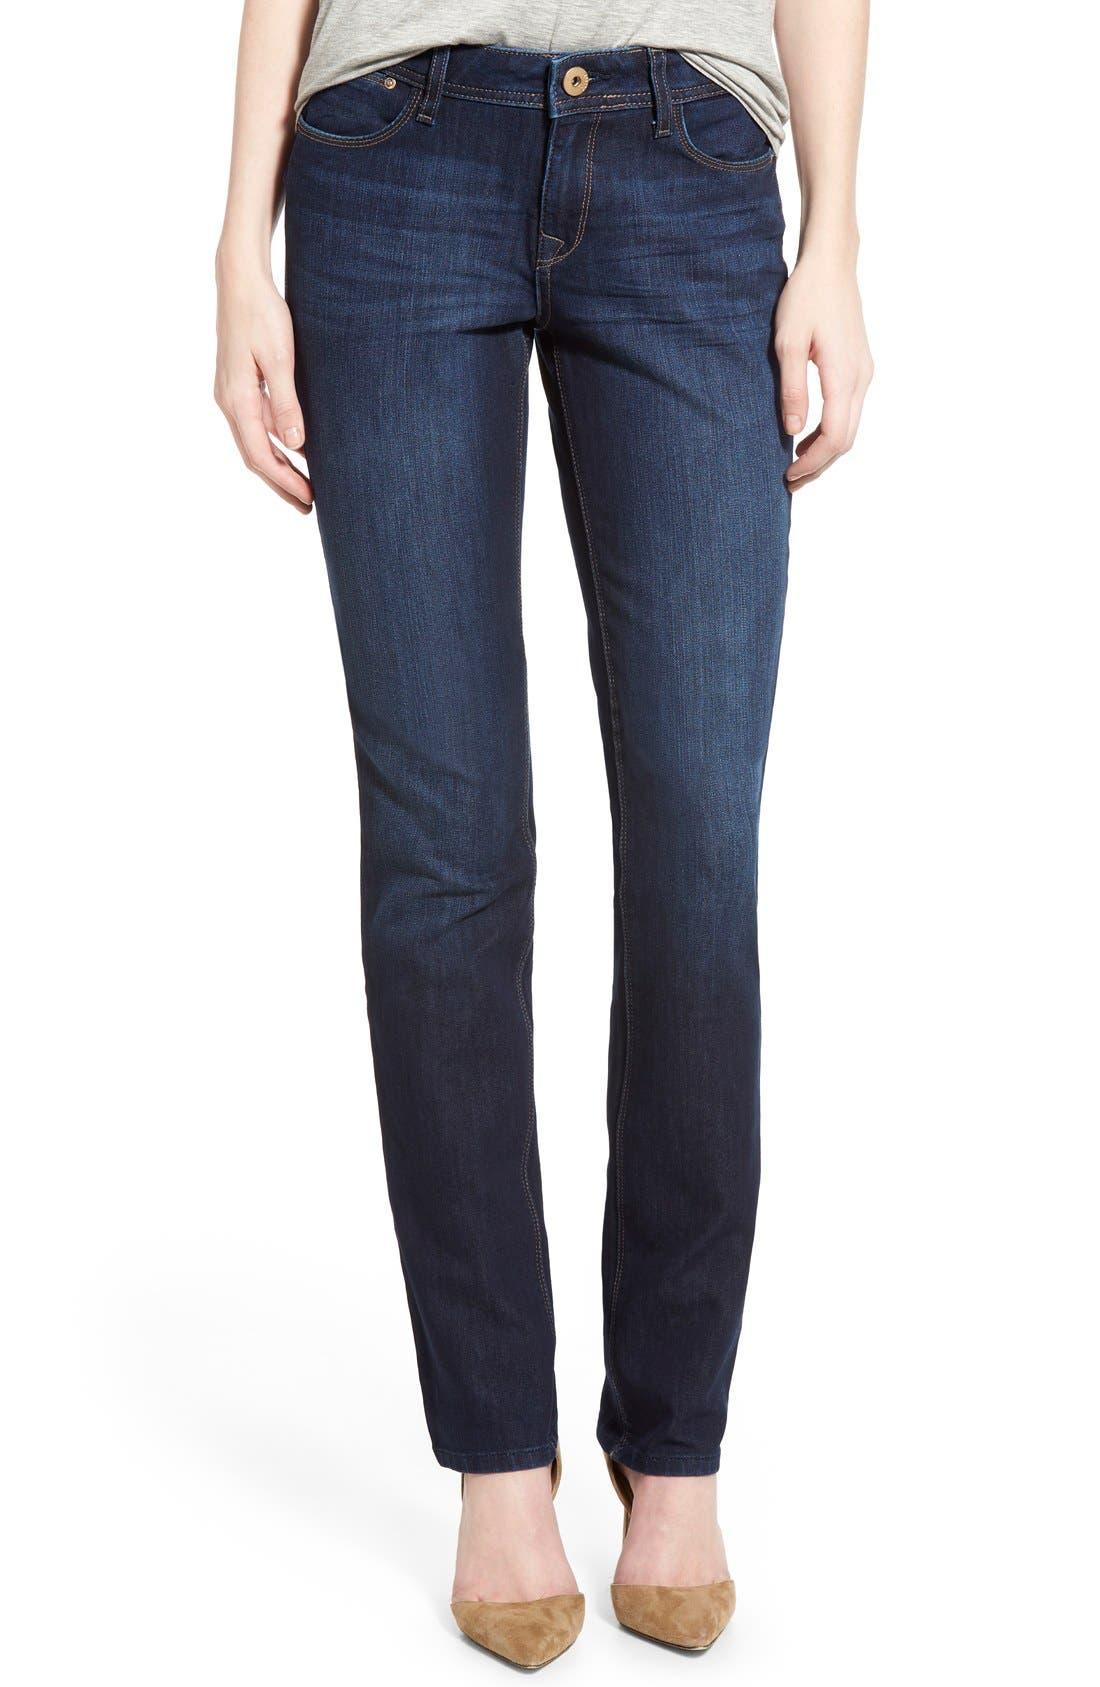 'Coco' Curvy Straight Jeans,                         Main,                         color, Solo